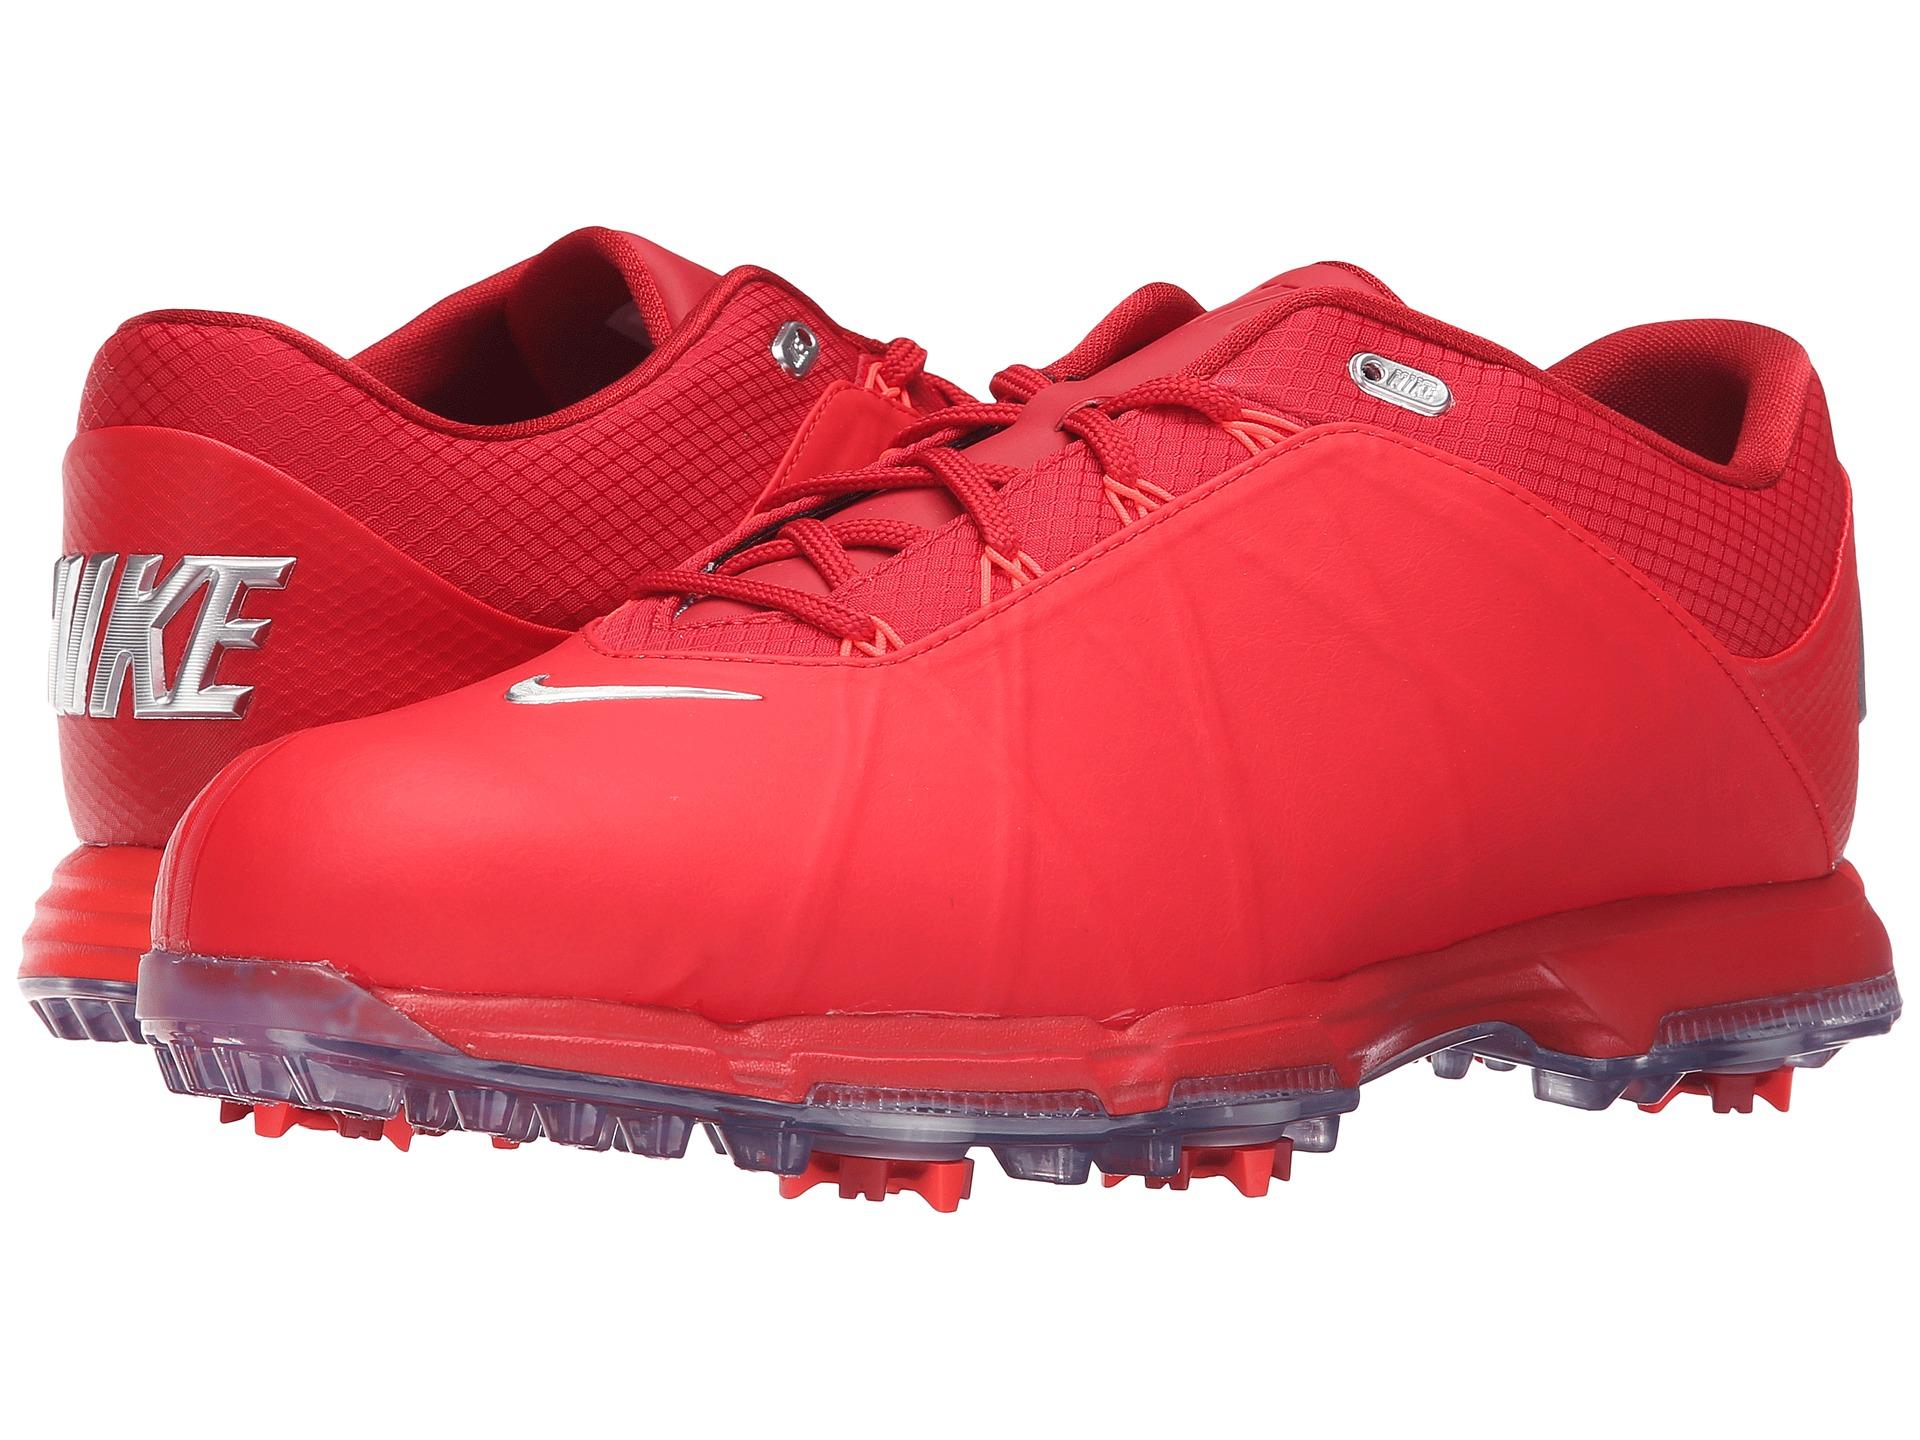 a0f73b8d3c92 Lyst - Nike Nike Lunar Fire in Red for Men